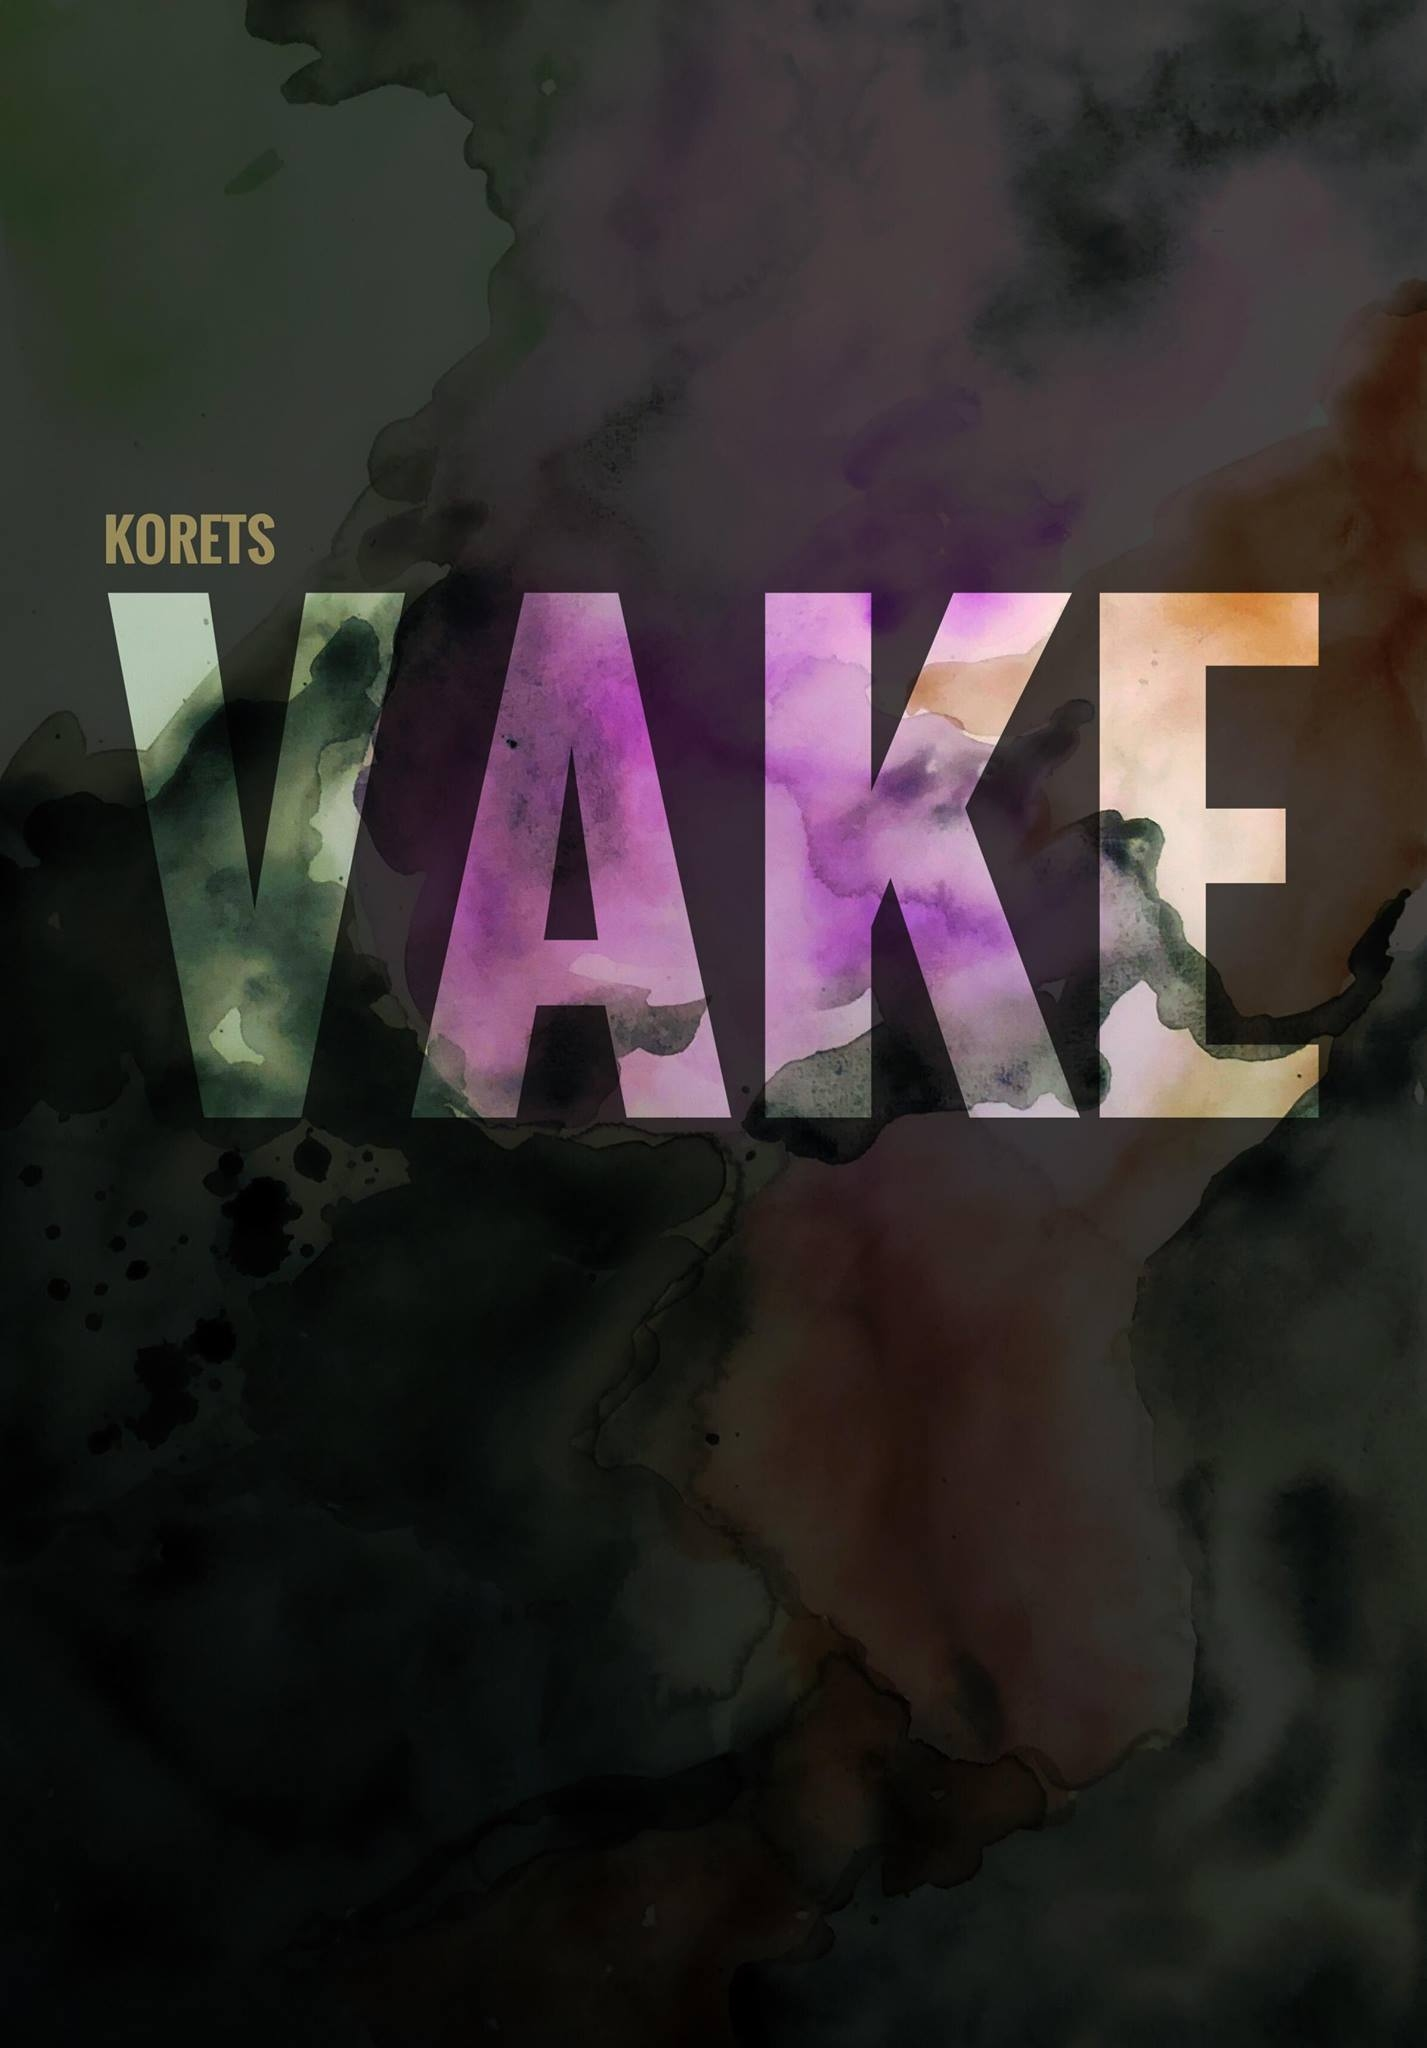 KORETs VAKE